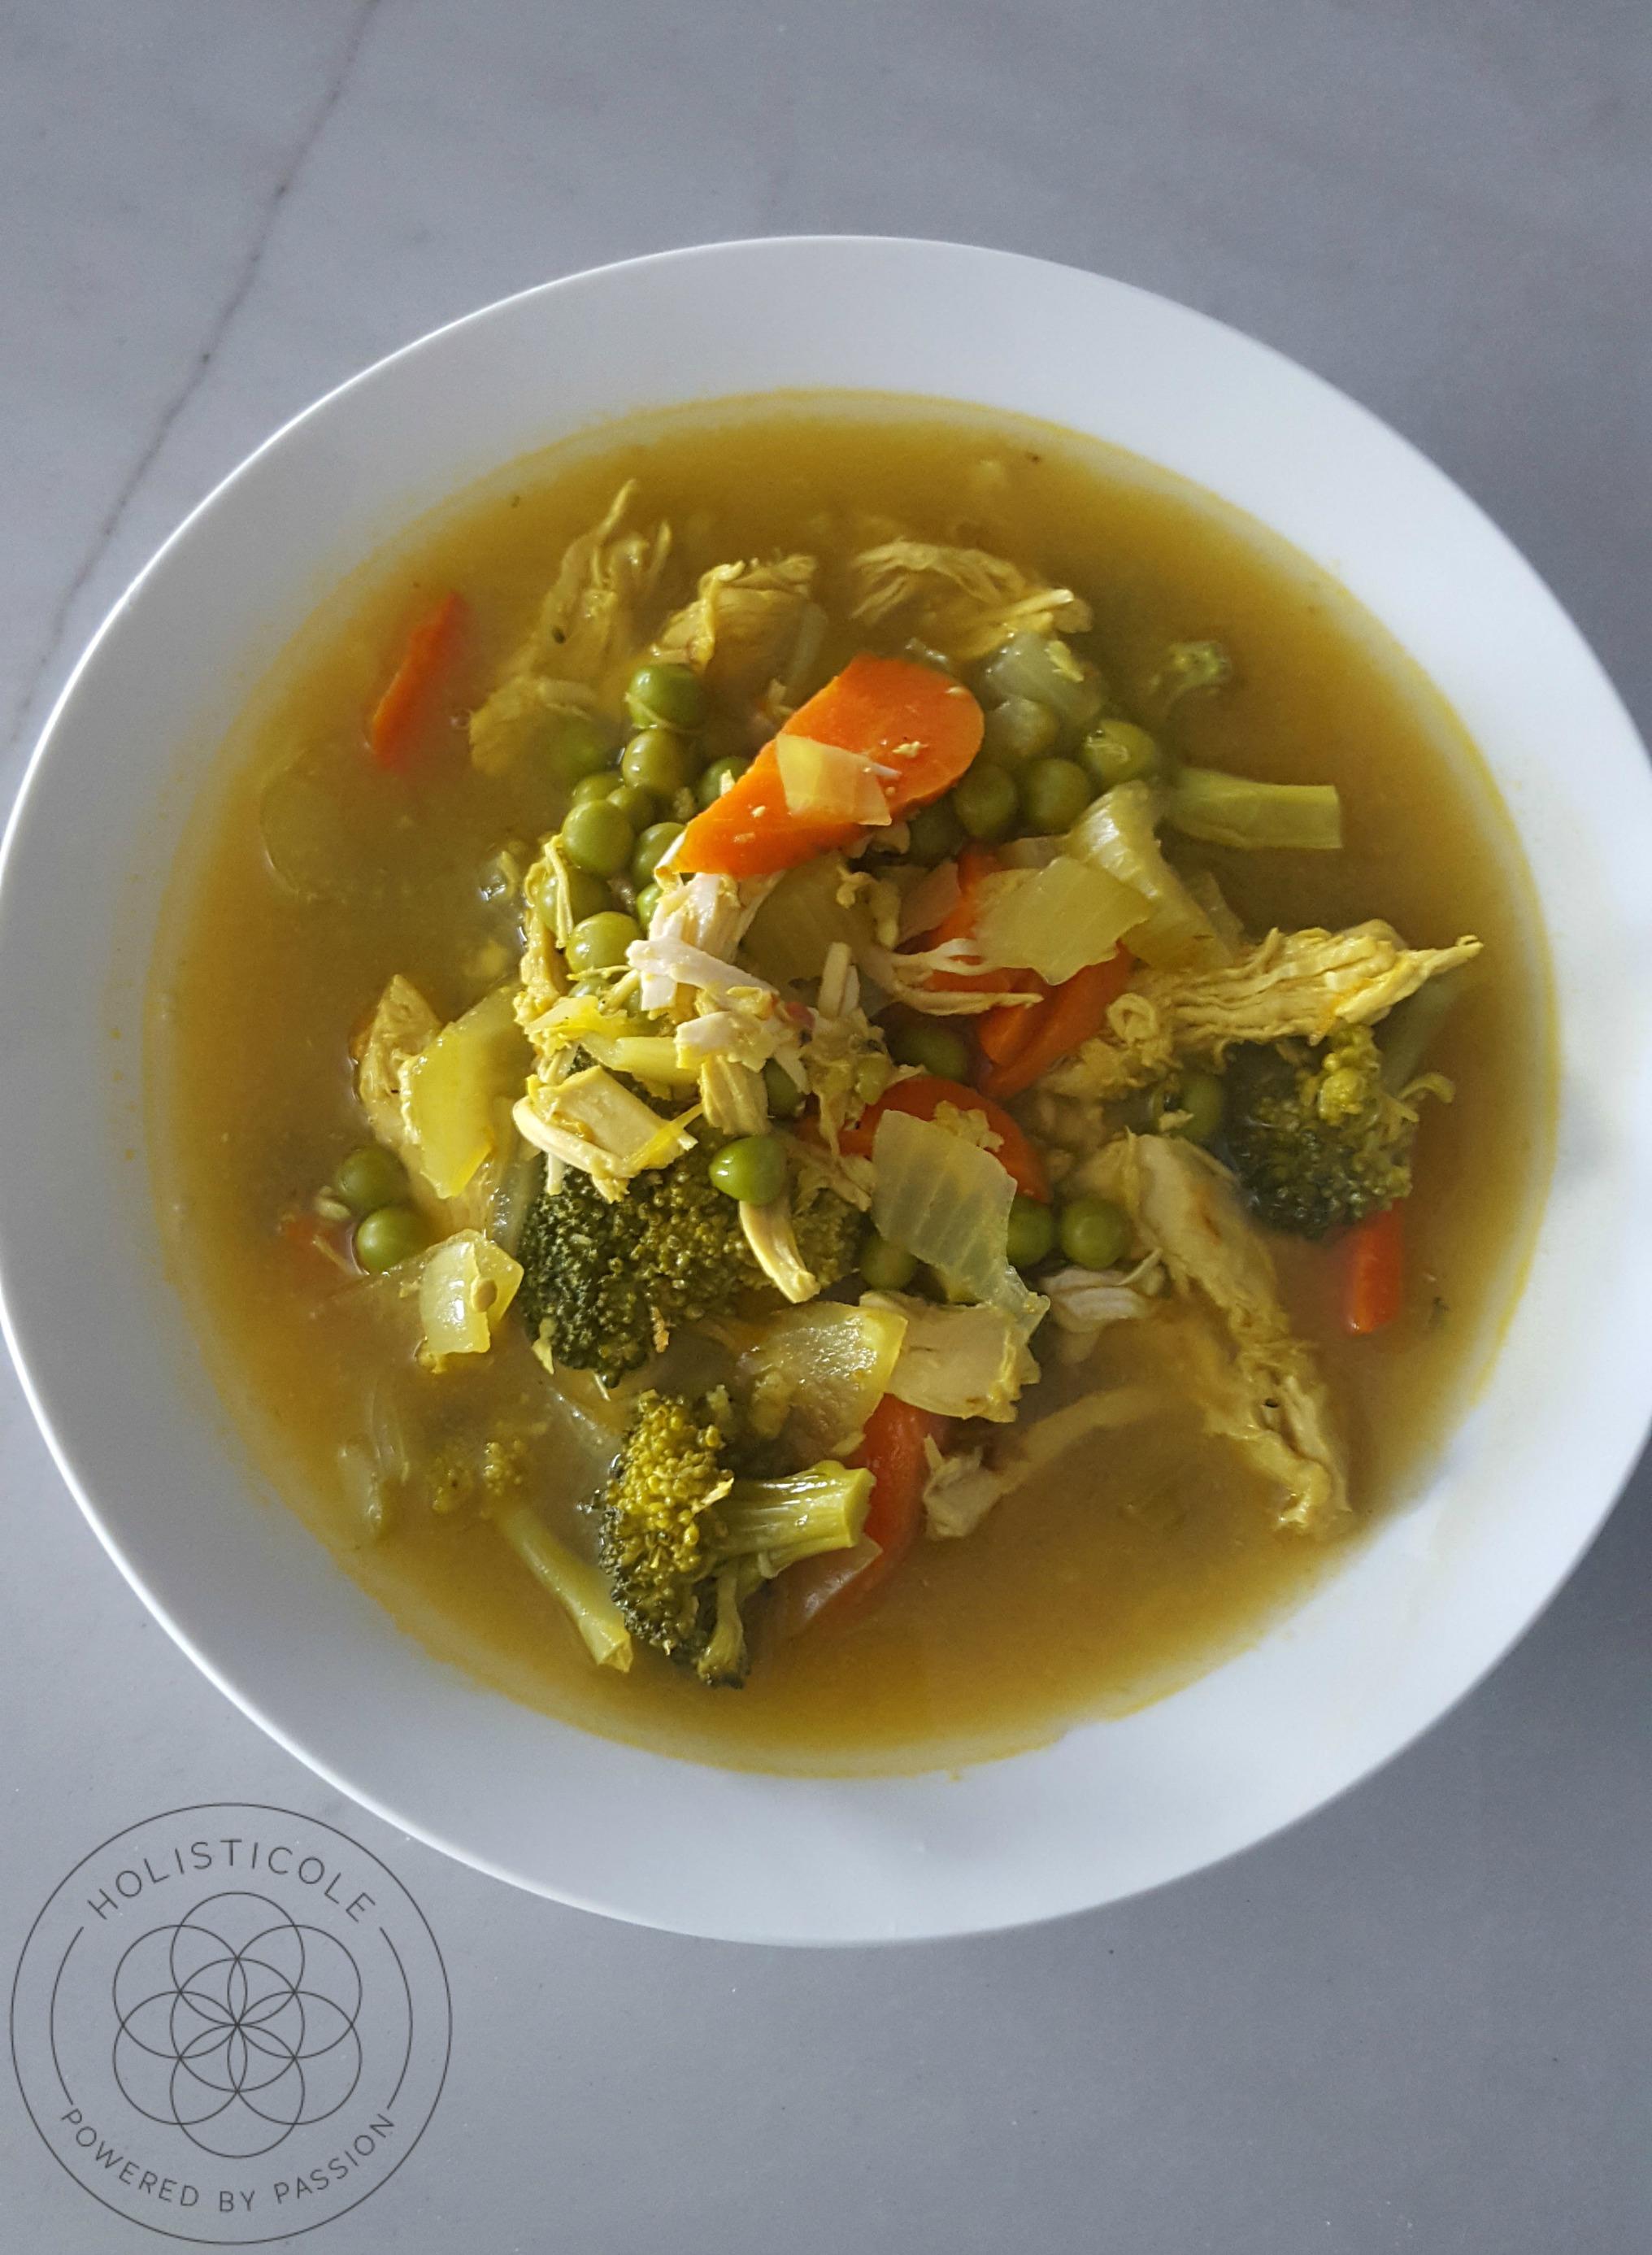 Chicken Detox Soup - Holisticole